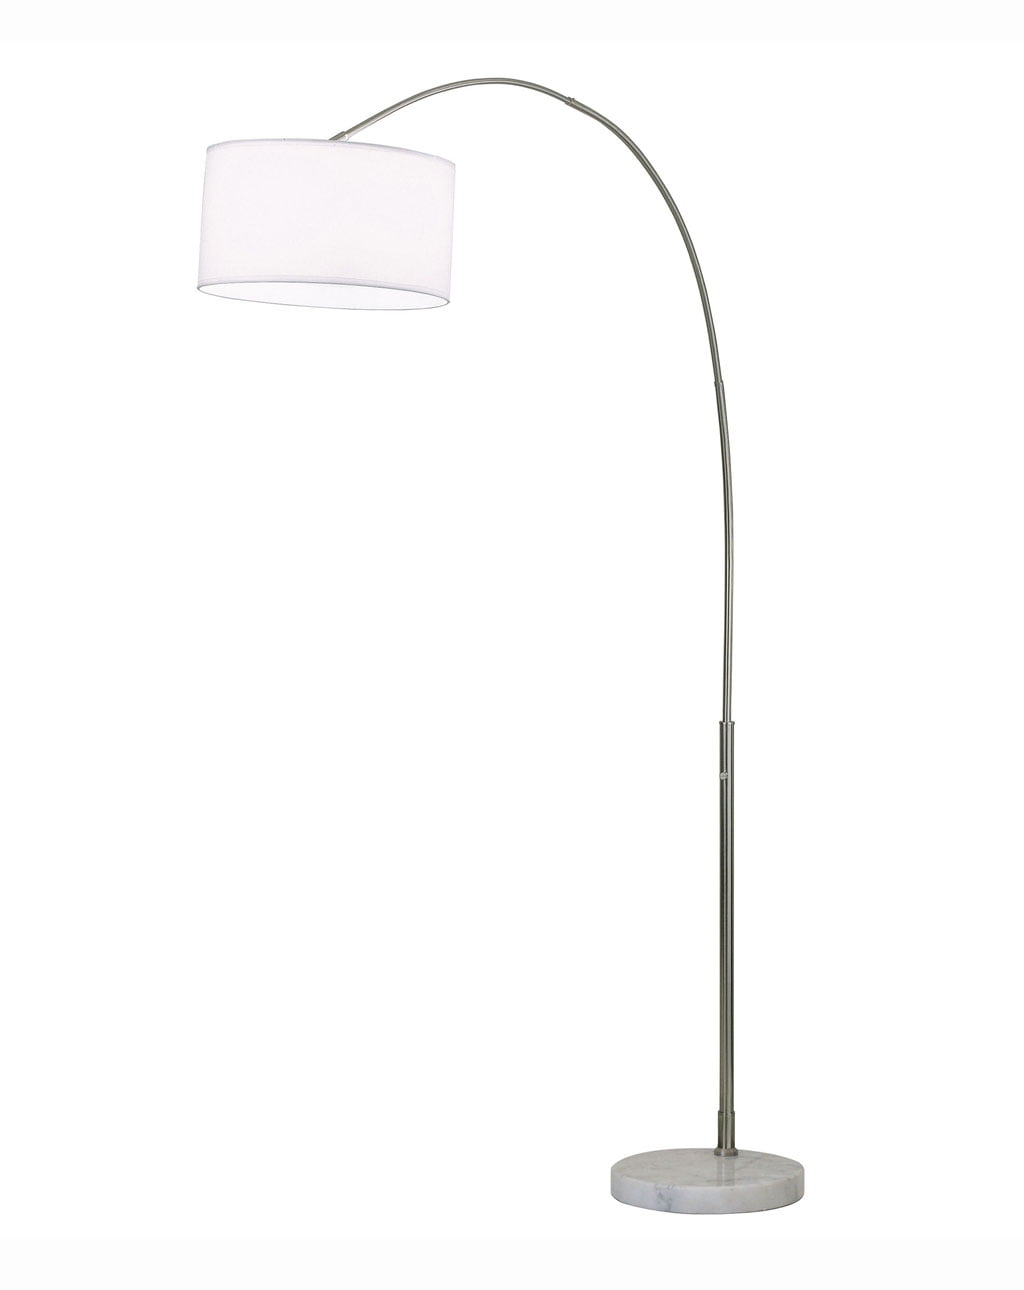 Float Arc Lamp